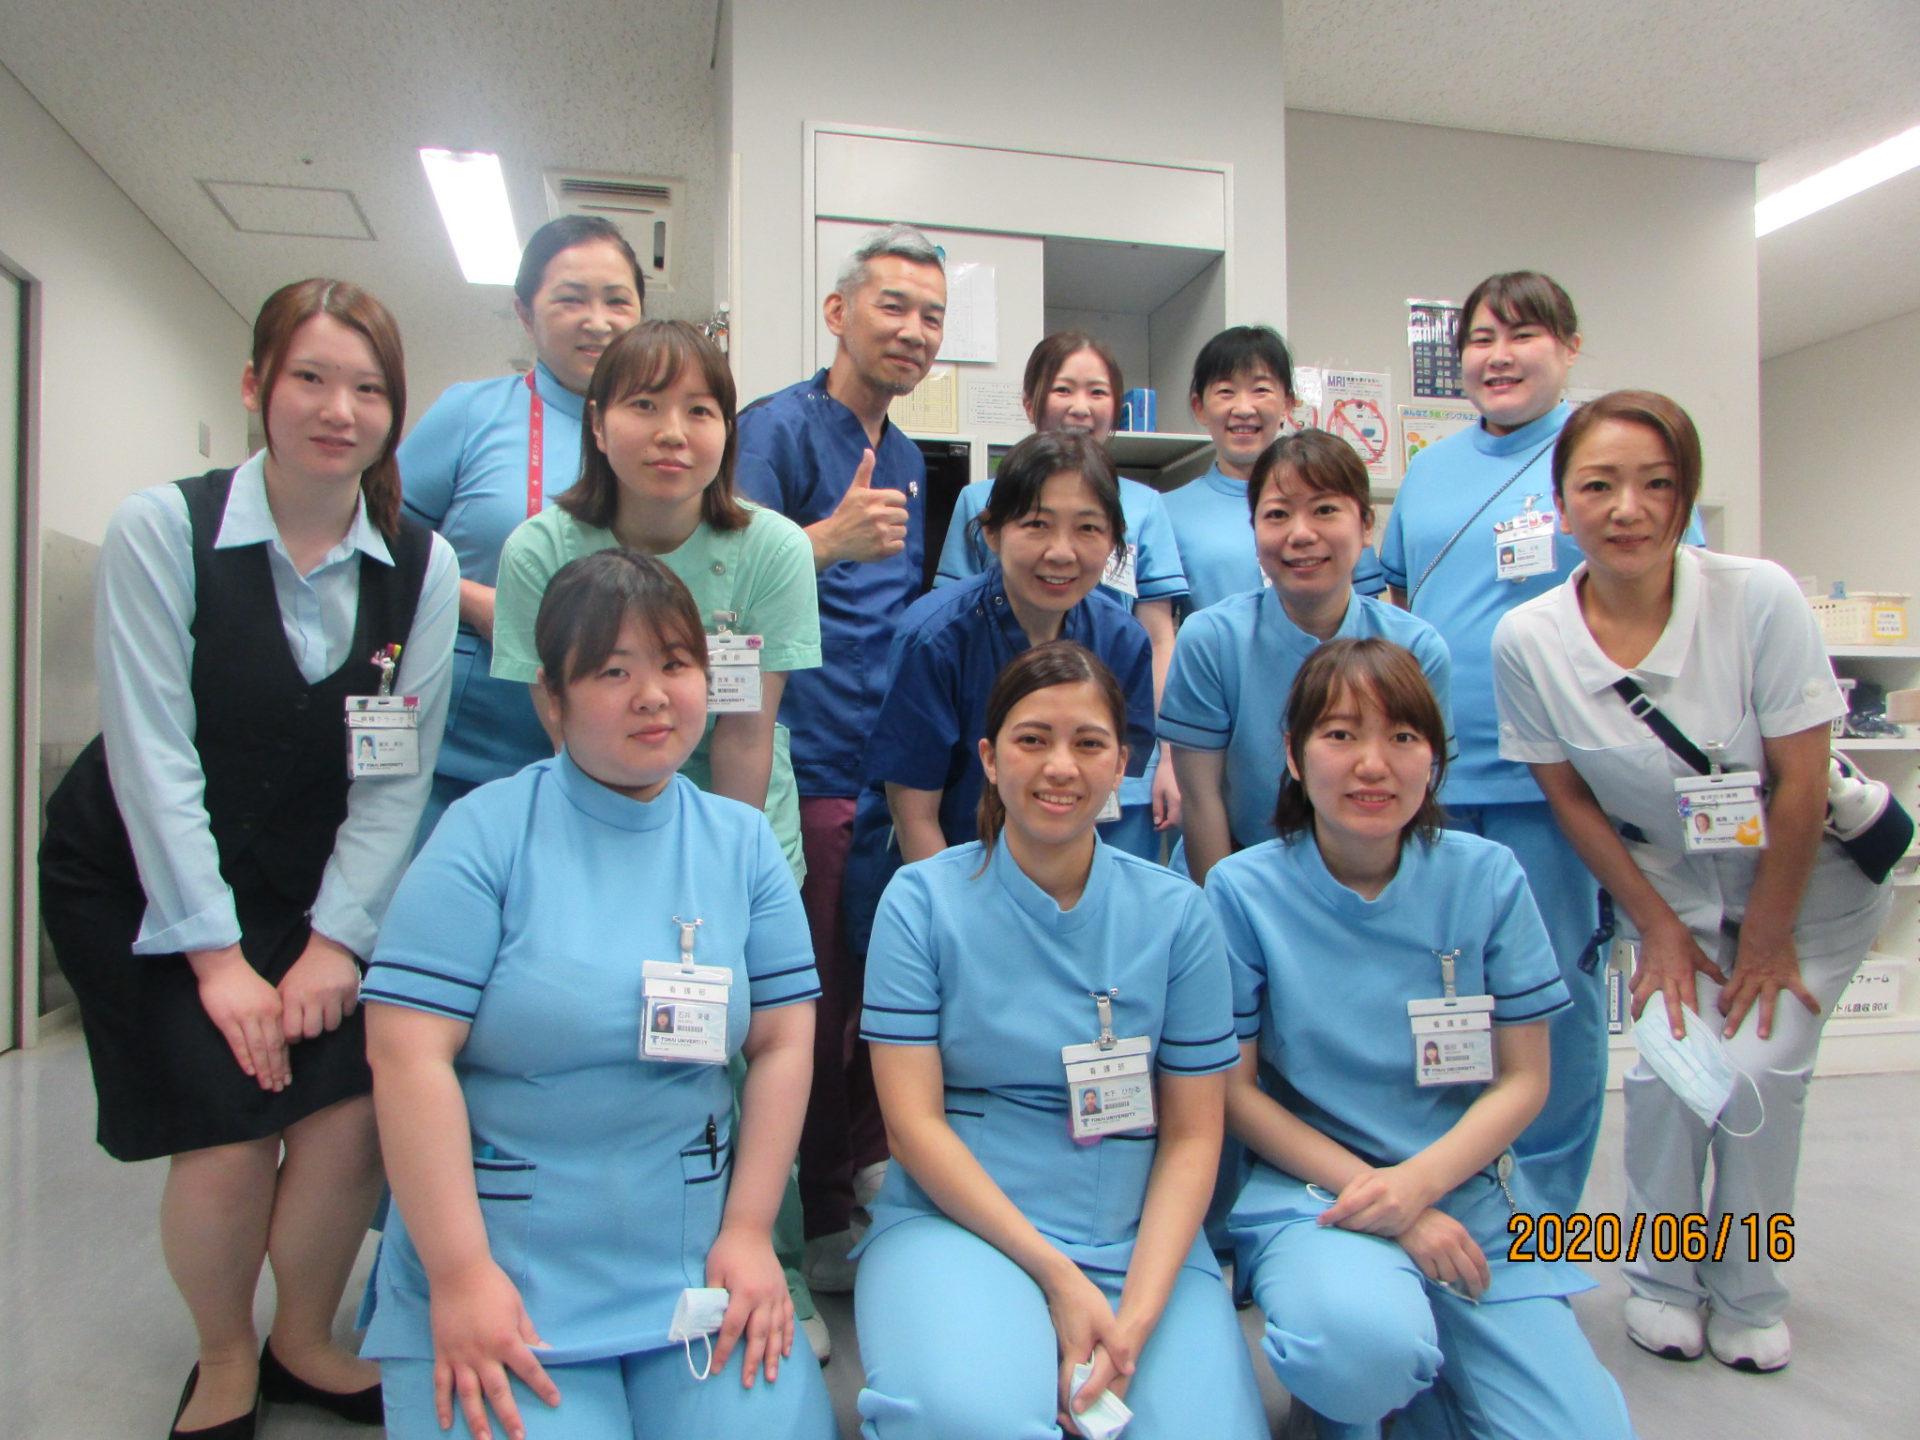 8B病棟:腎透析科、糖・代謝内科、眼科、形成外科、耳鼻咽喉科、皮膚科、救急医学科